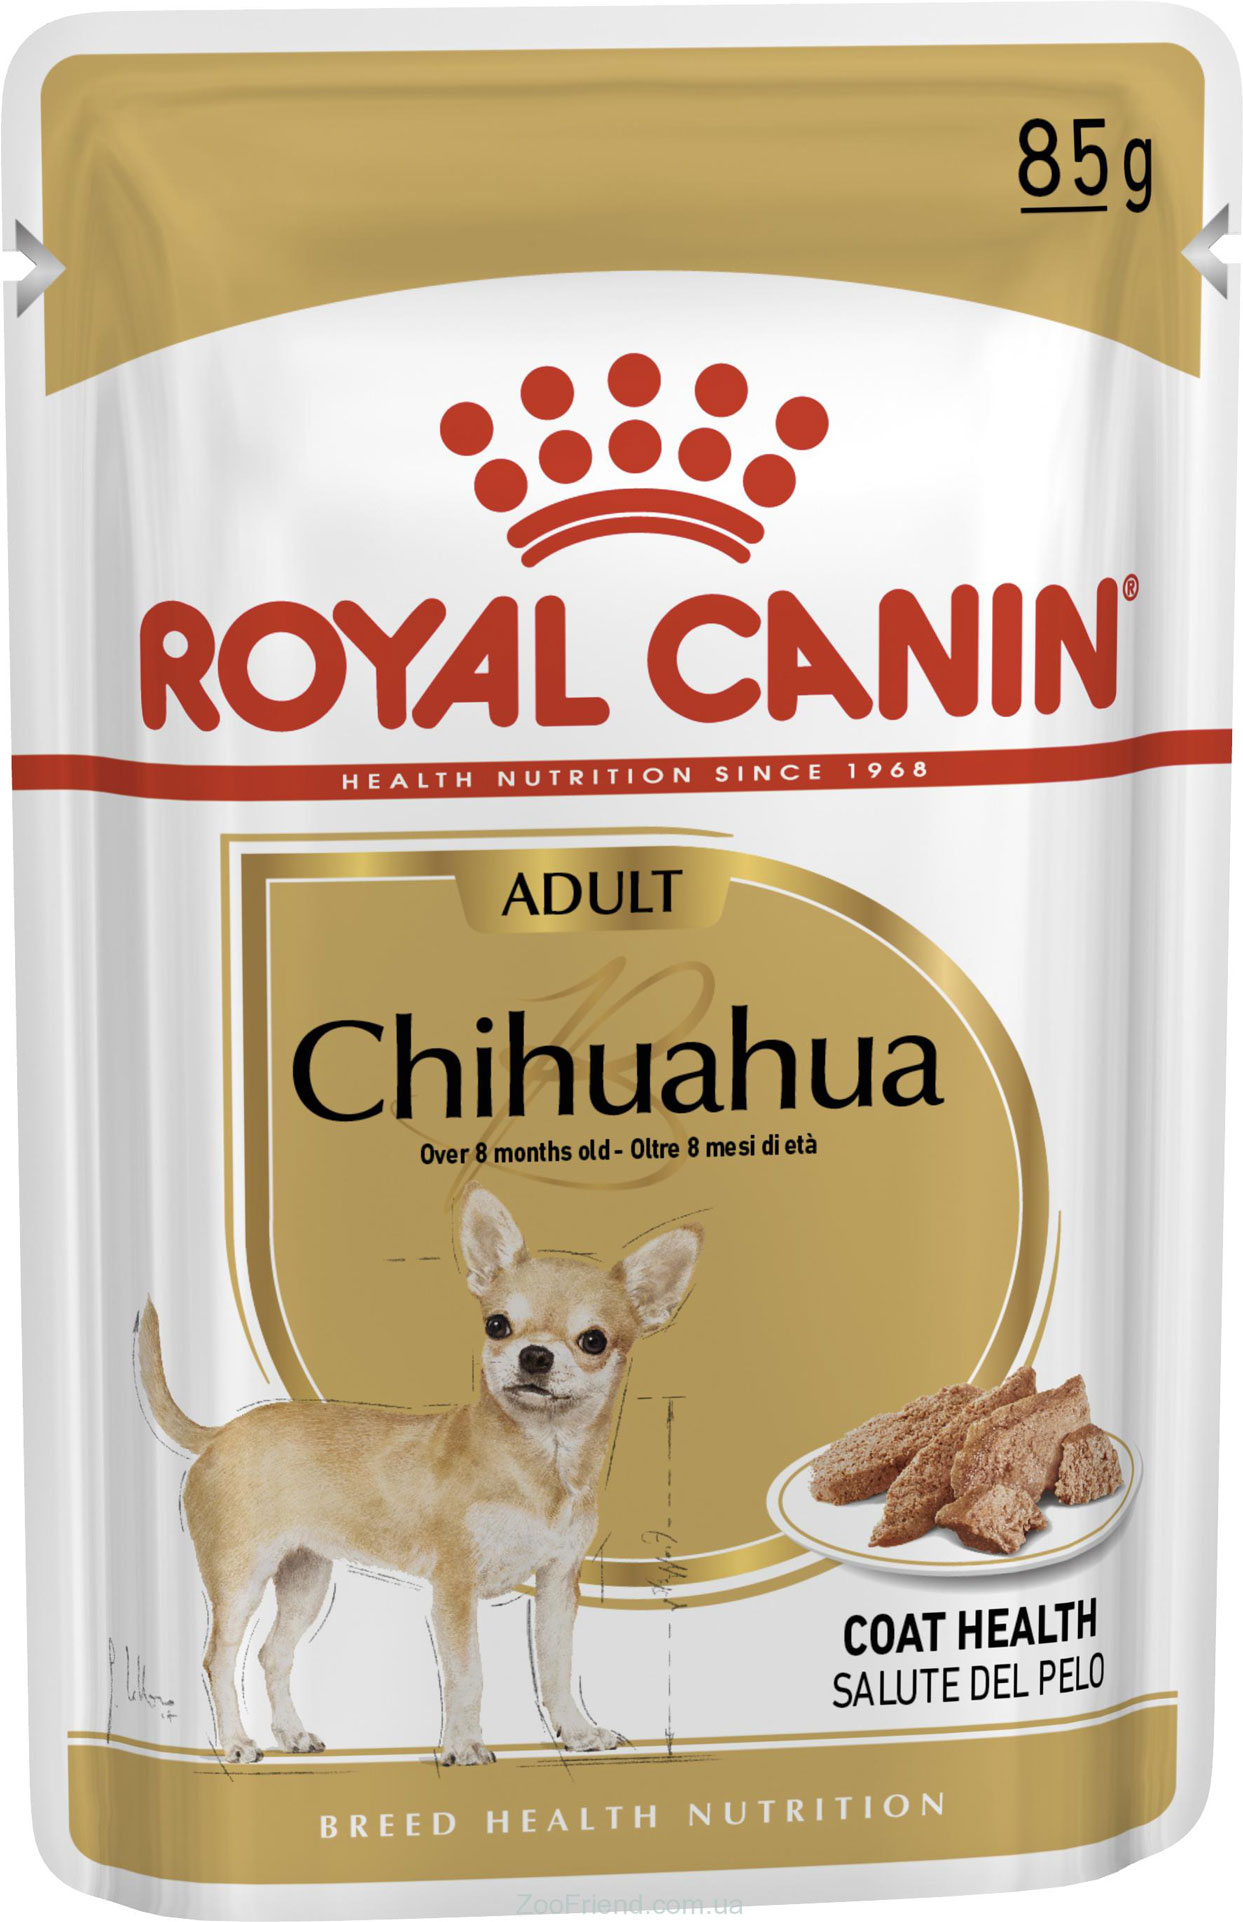 ROYAL CANIN CHIHUAHUA ADULT – влажный корм для взрослых собак породы чихуахуа